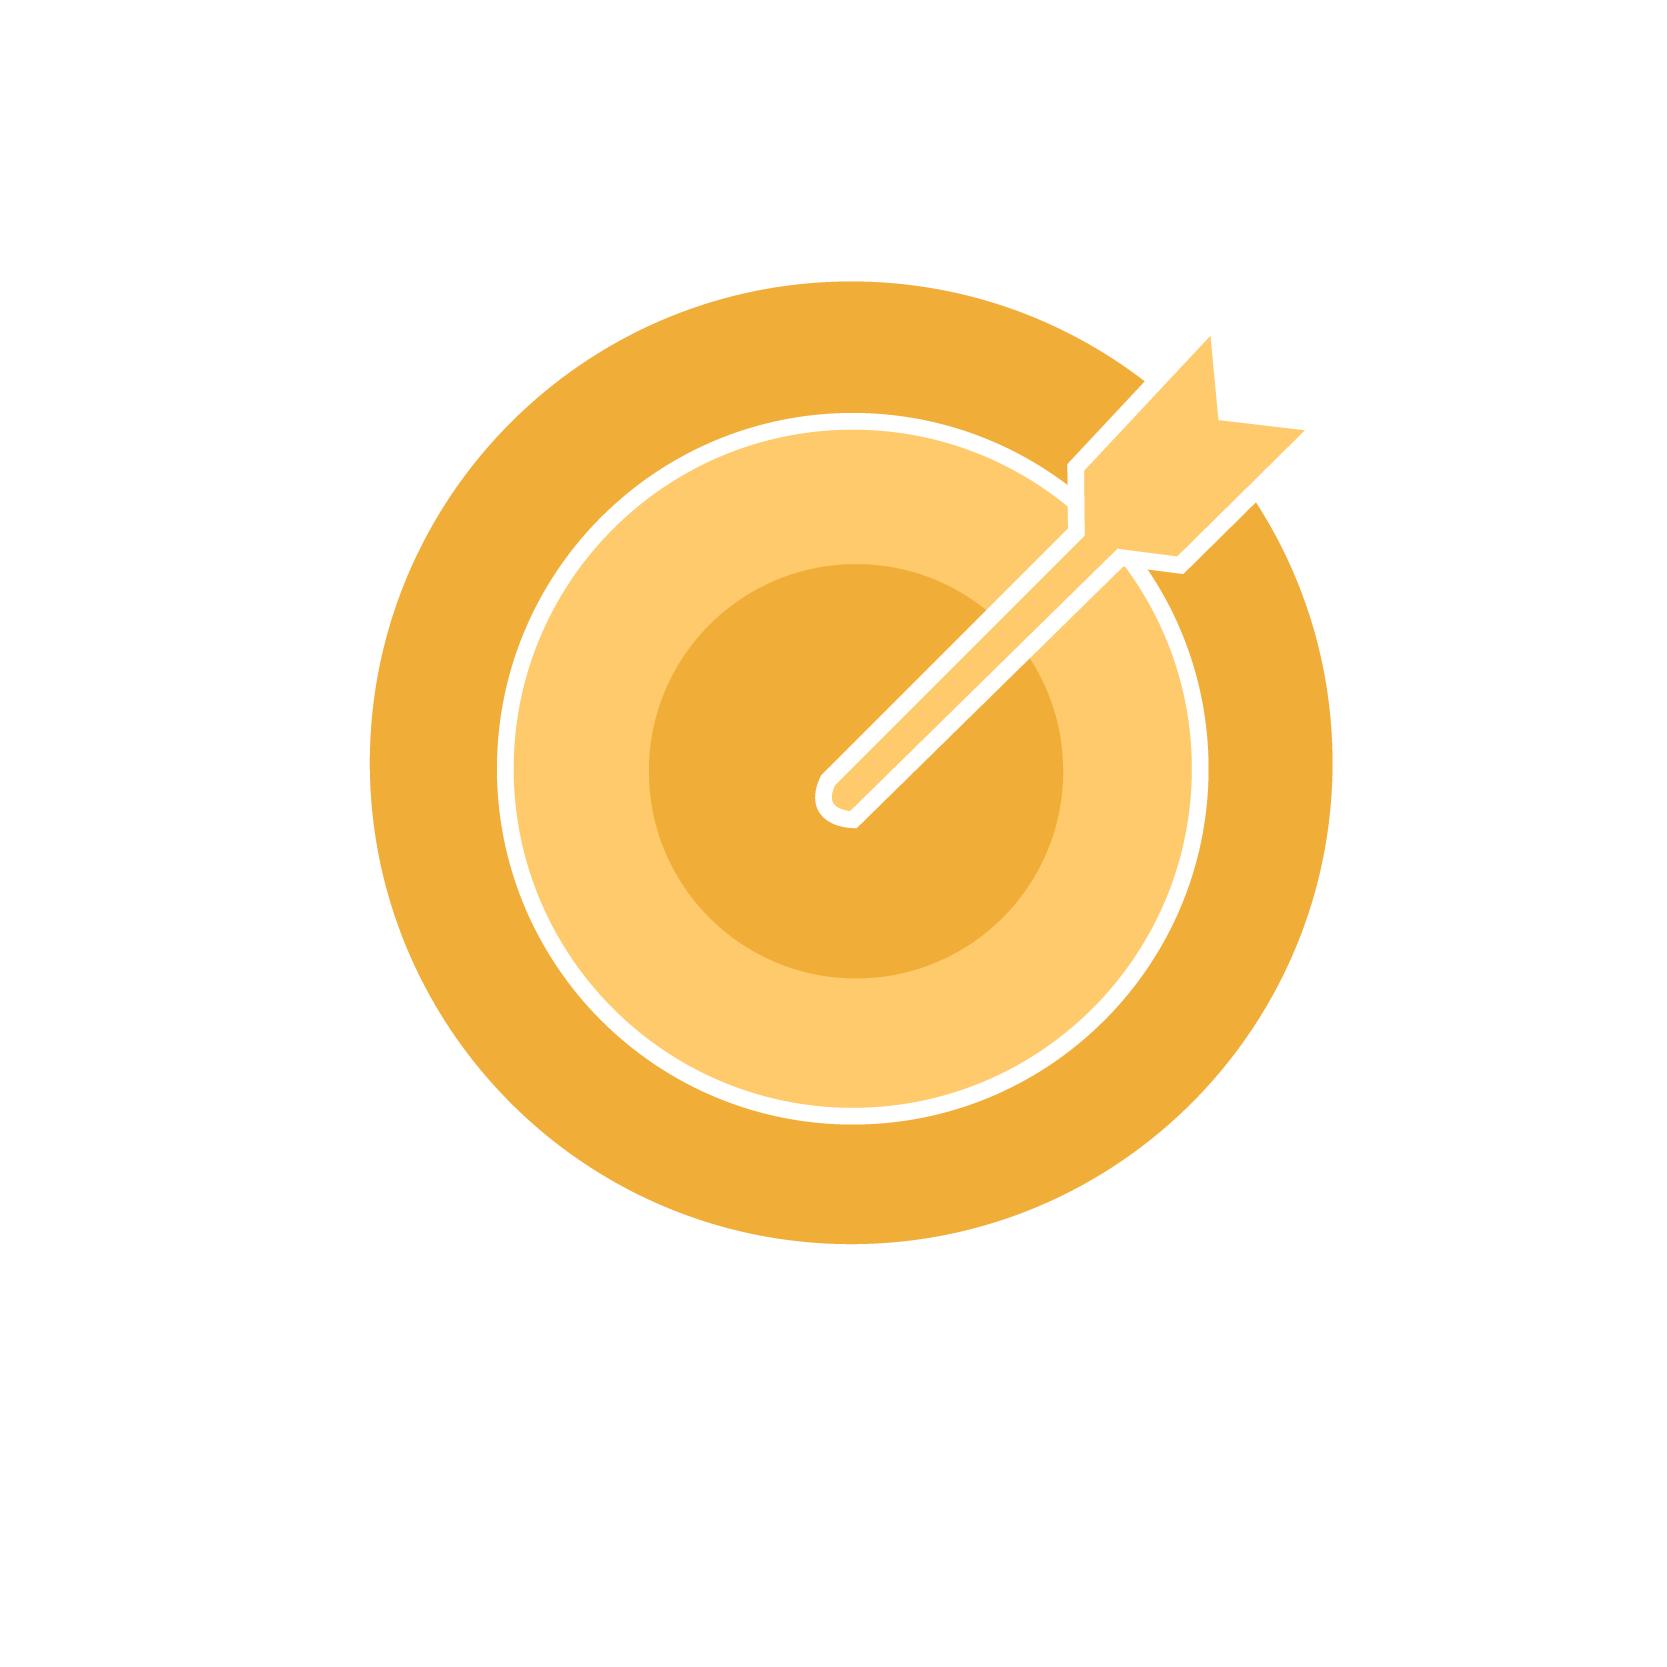 Kent State University Effective Learning Goal Setting Bullseye Icon